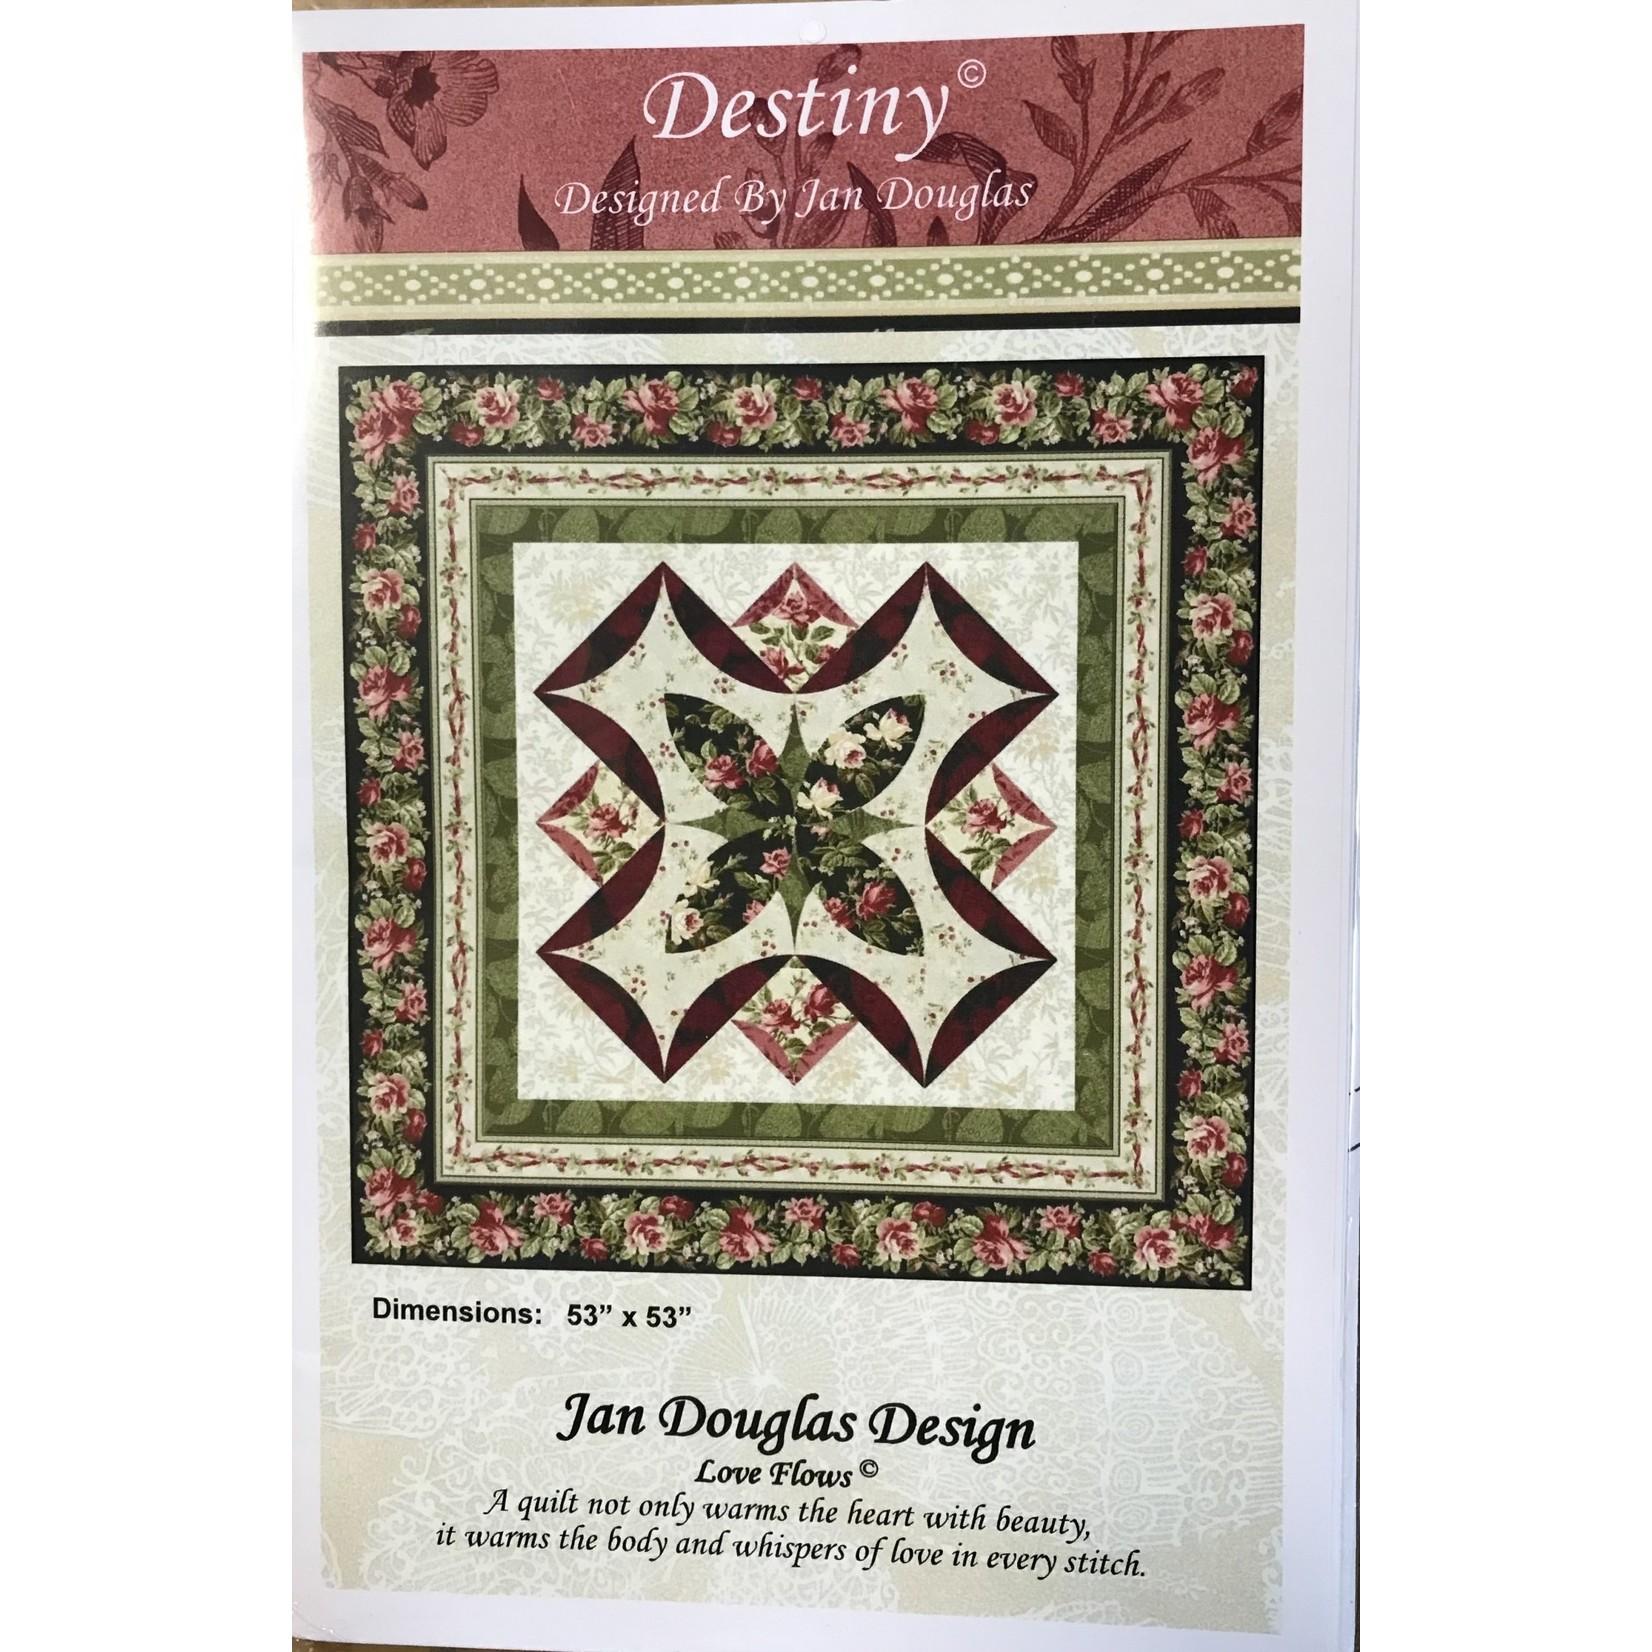 Jan Douglas Design DESTINY PATTERN